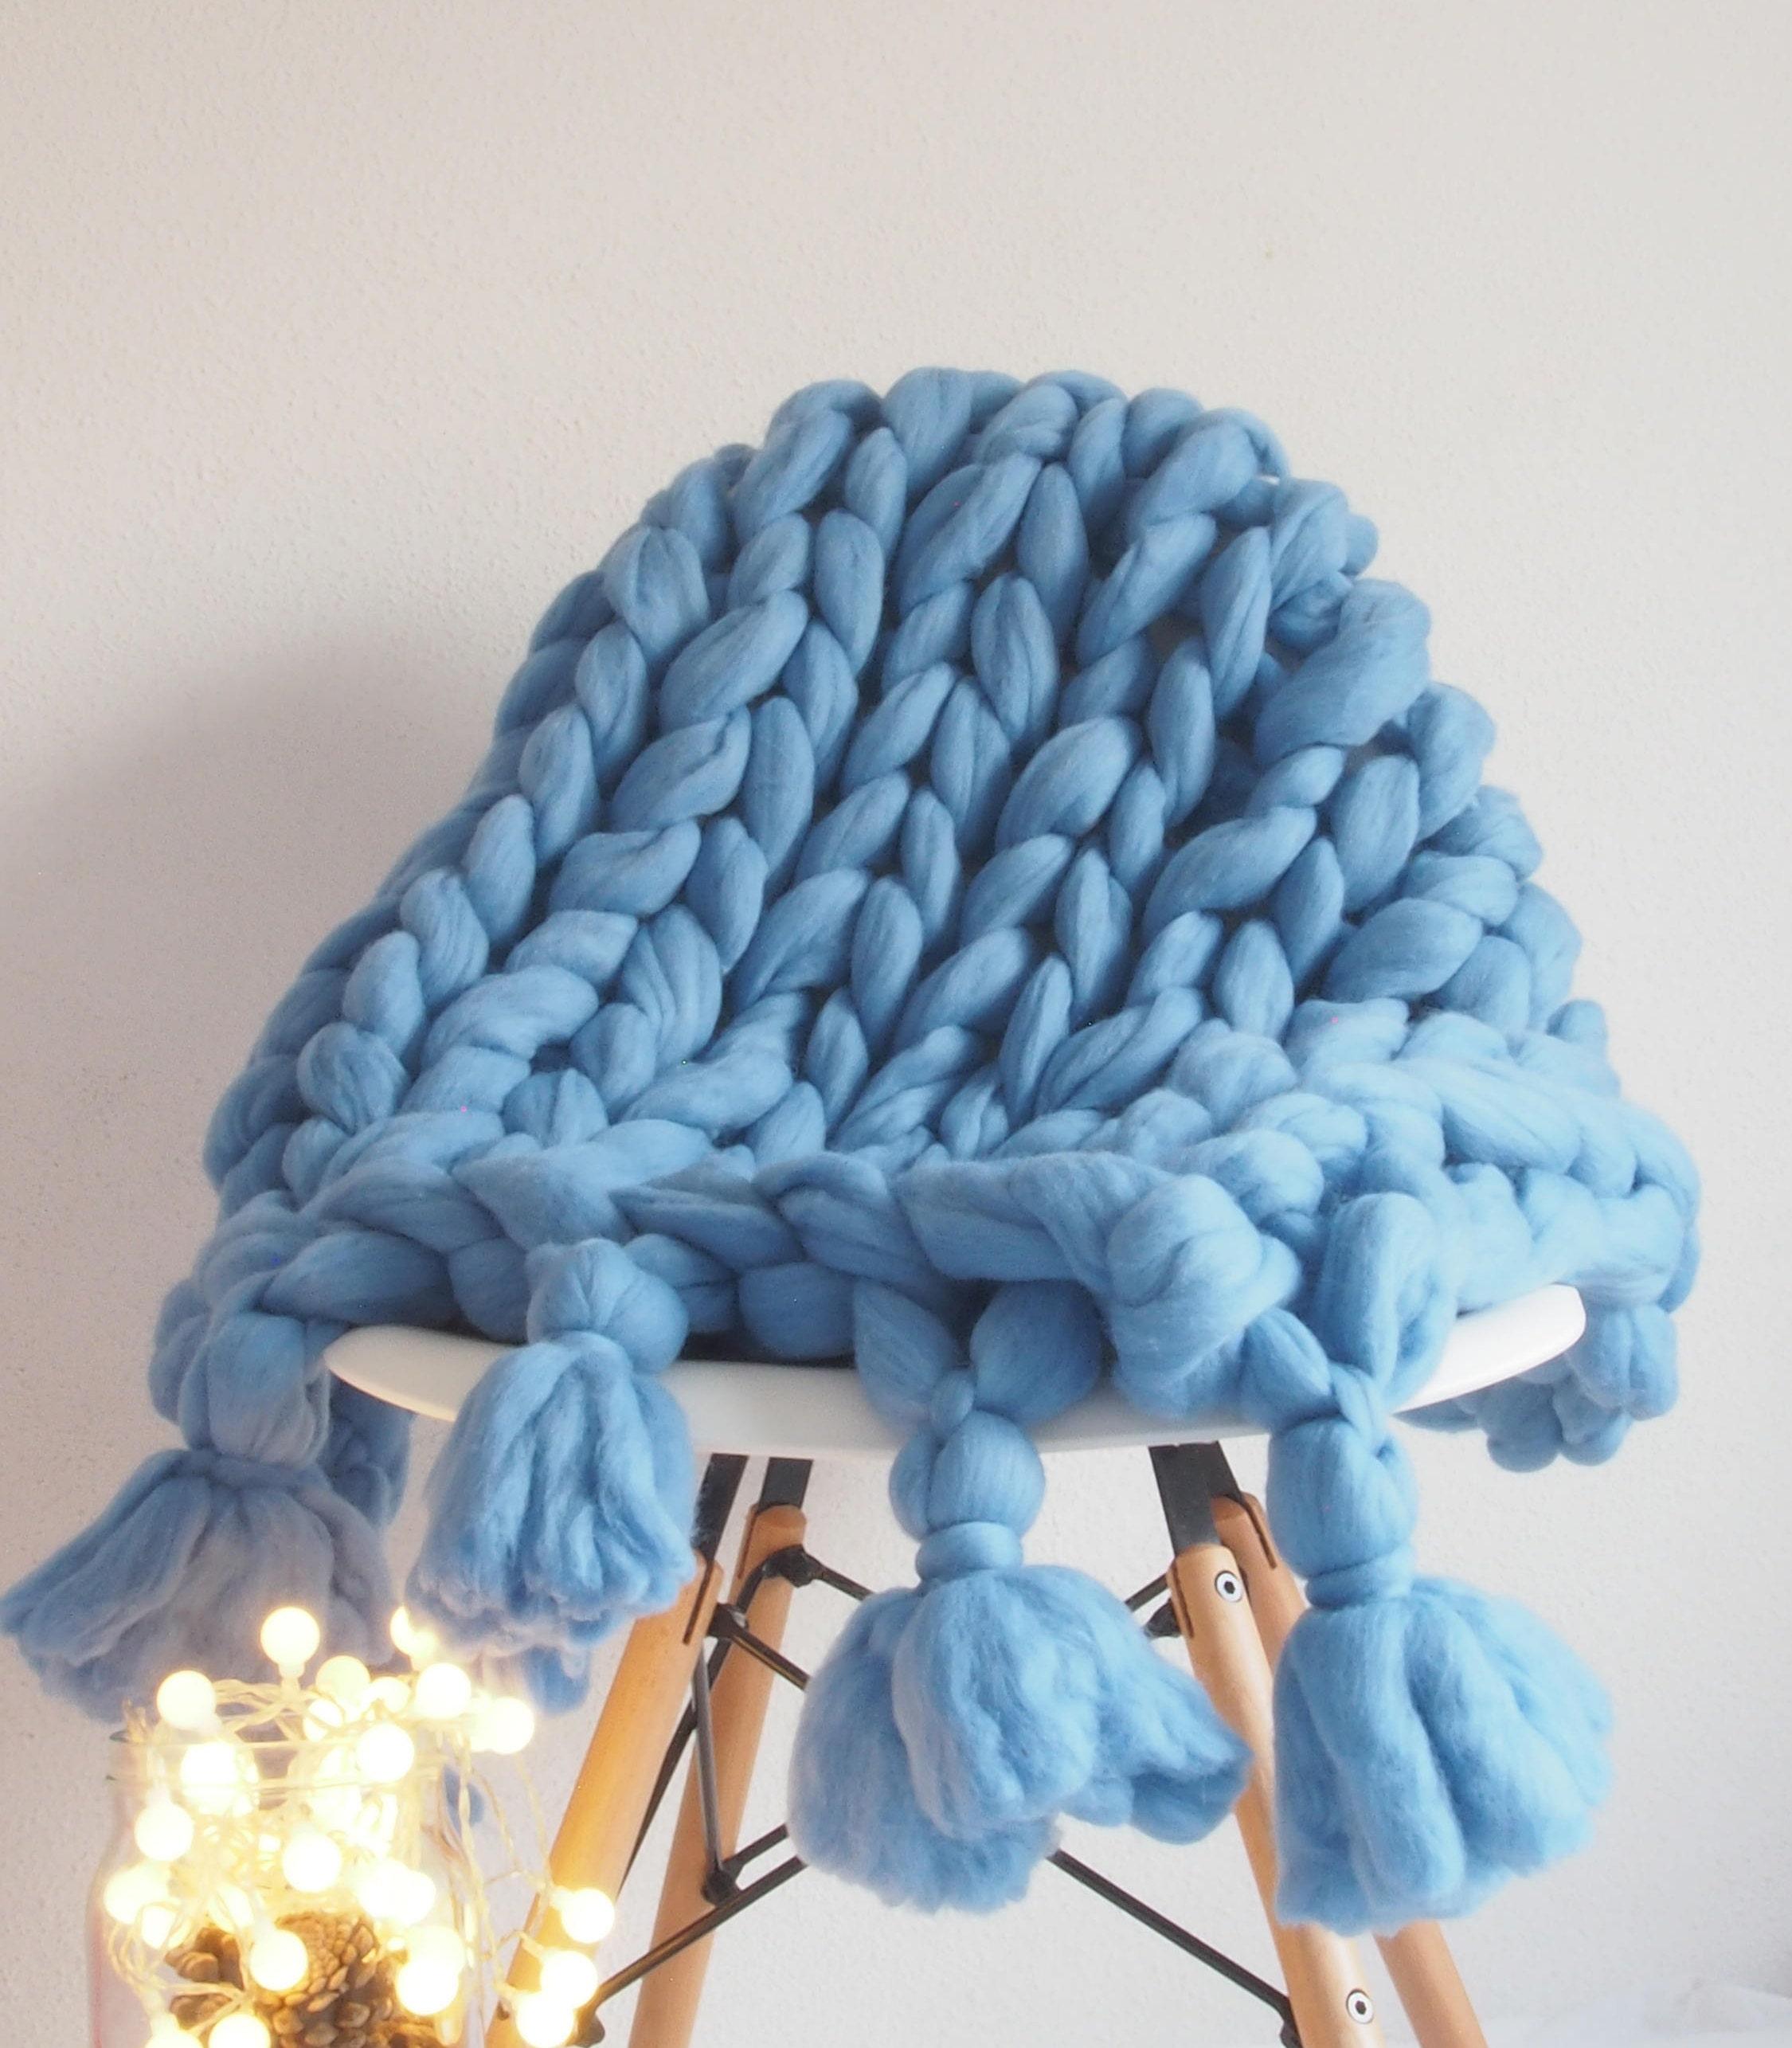 chunky knit blanket manta xxl merino azul flecos couverture de laine xxl merinos bleu blue. Black Bedroom Furniture Sets. Home Design Ideas